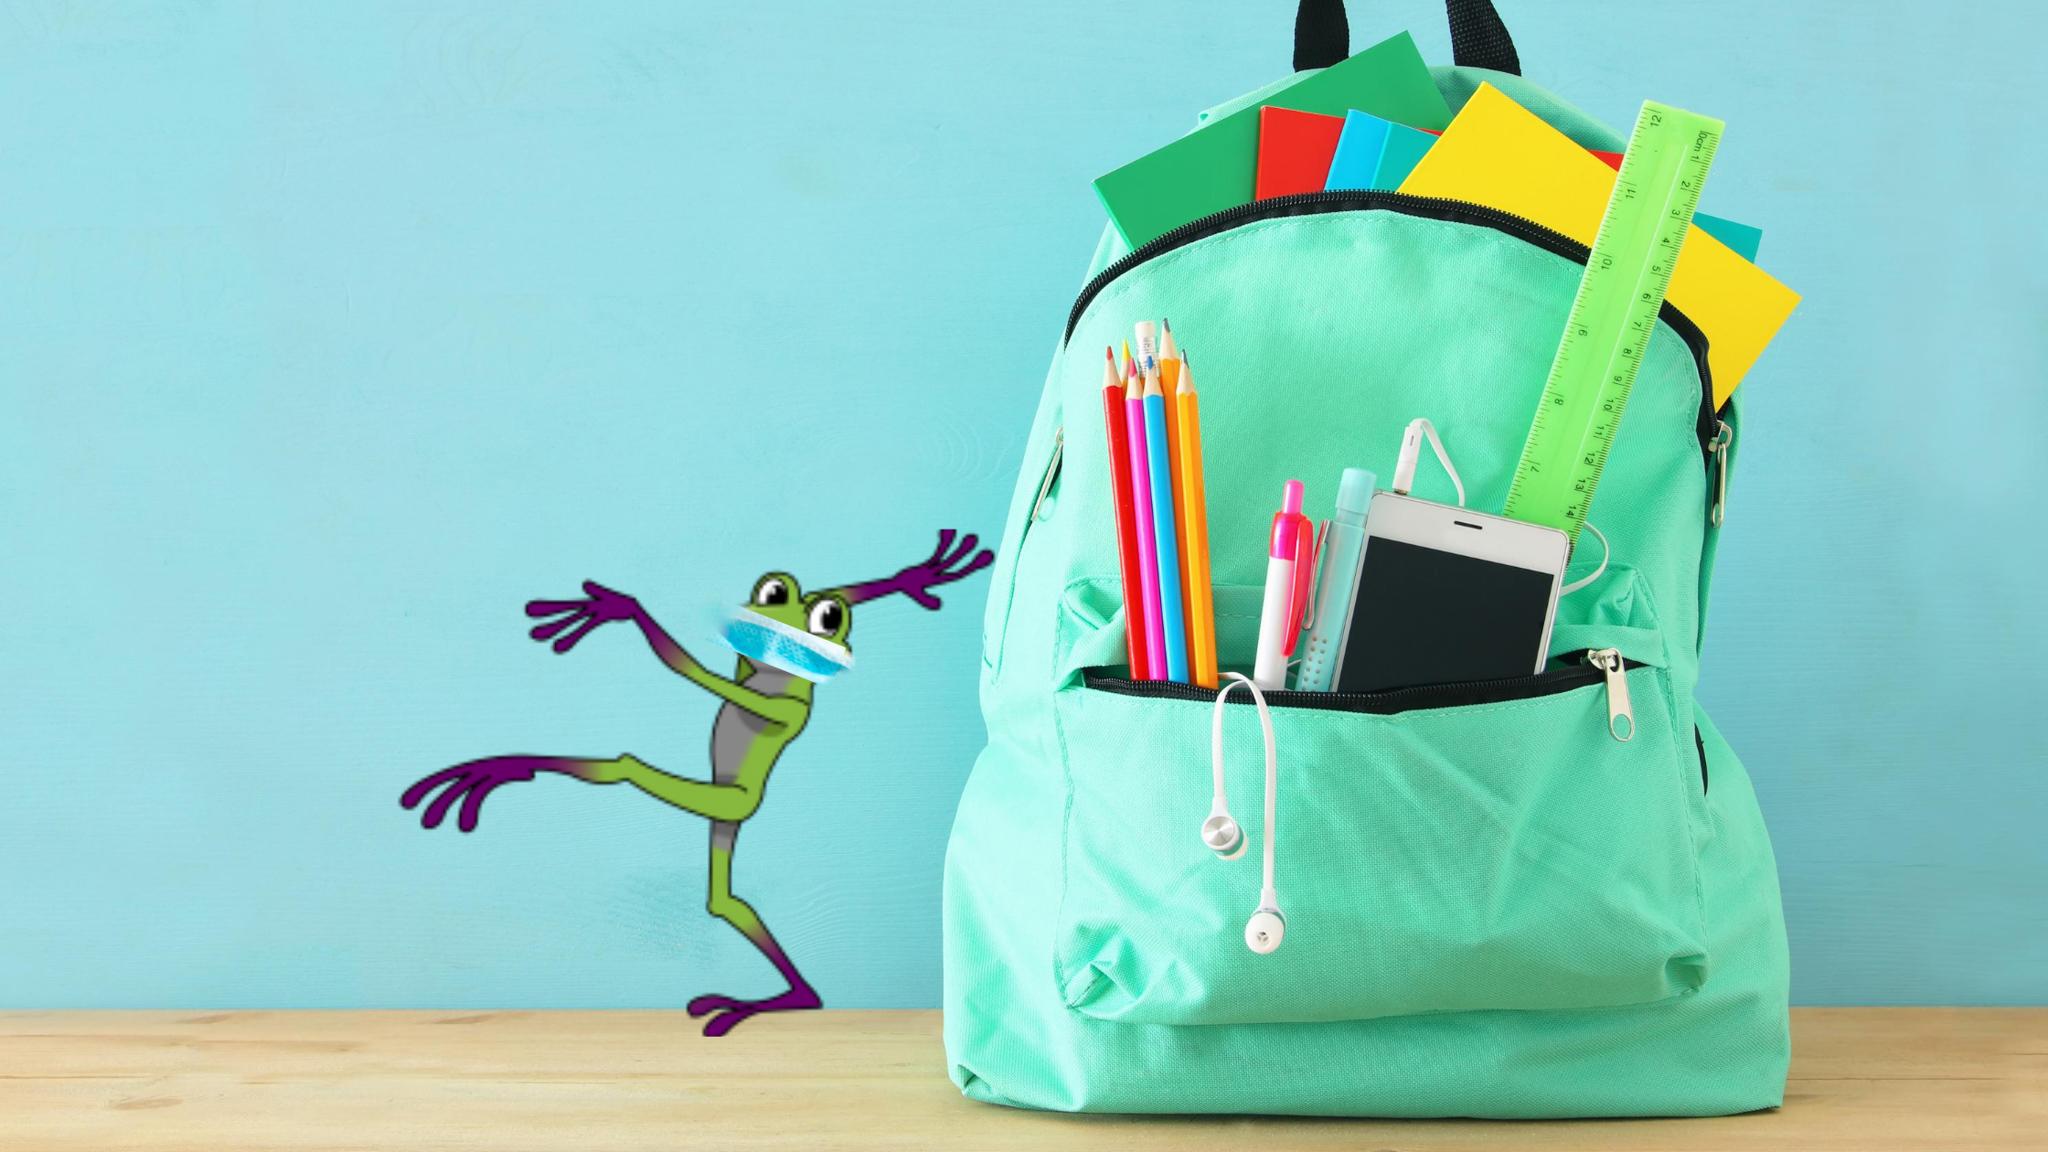 iTi's linguistic superhero Terpii grabs her backpack for school